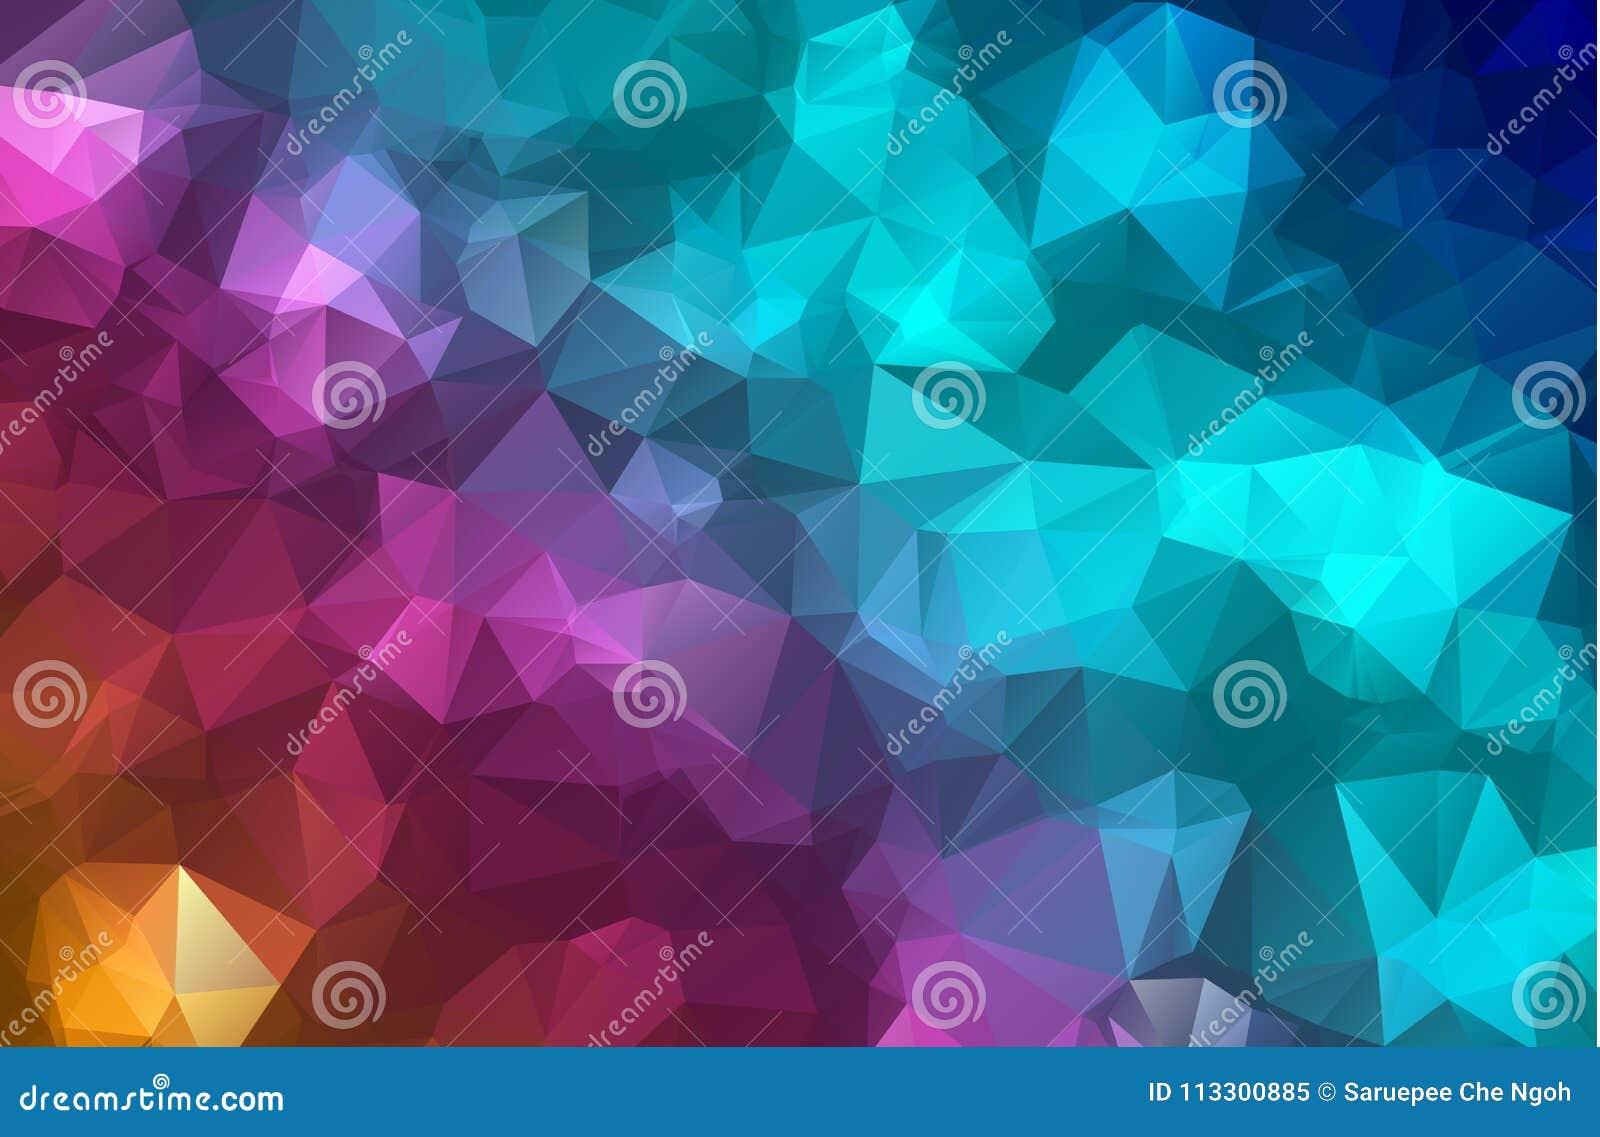 Vector o fundo geométrico poligonal moderno abstrato do triângulo do polígono Fundo geométrico colorido do triângulo